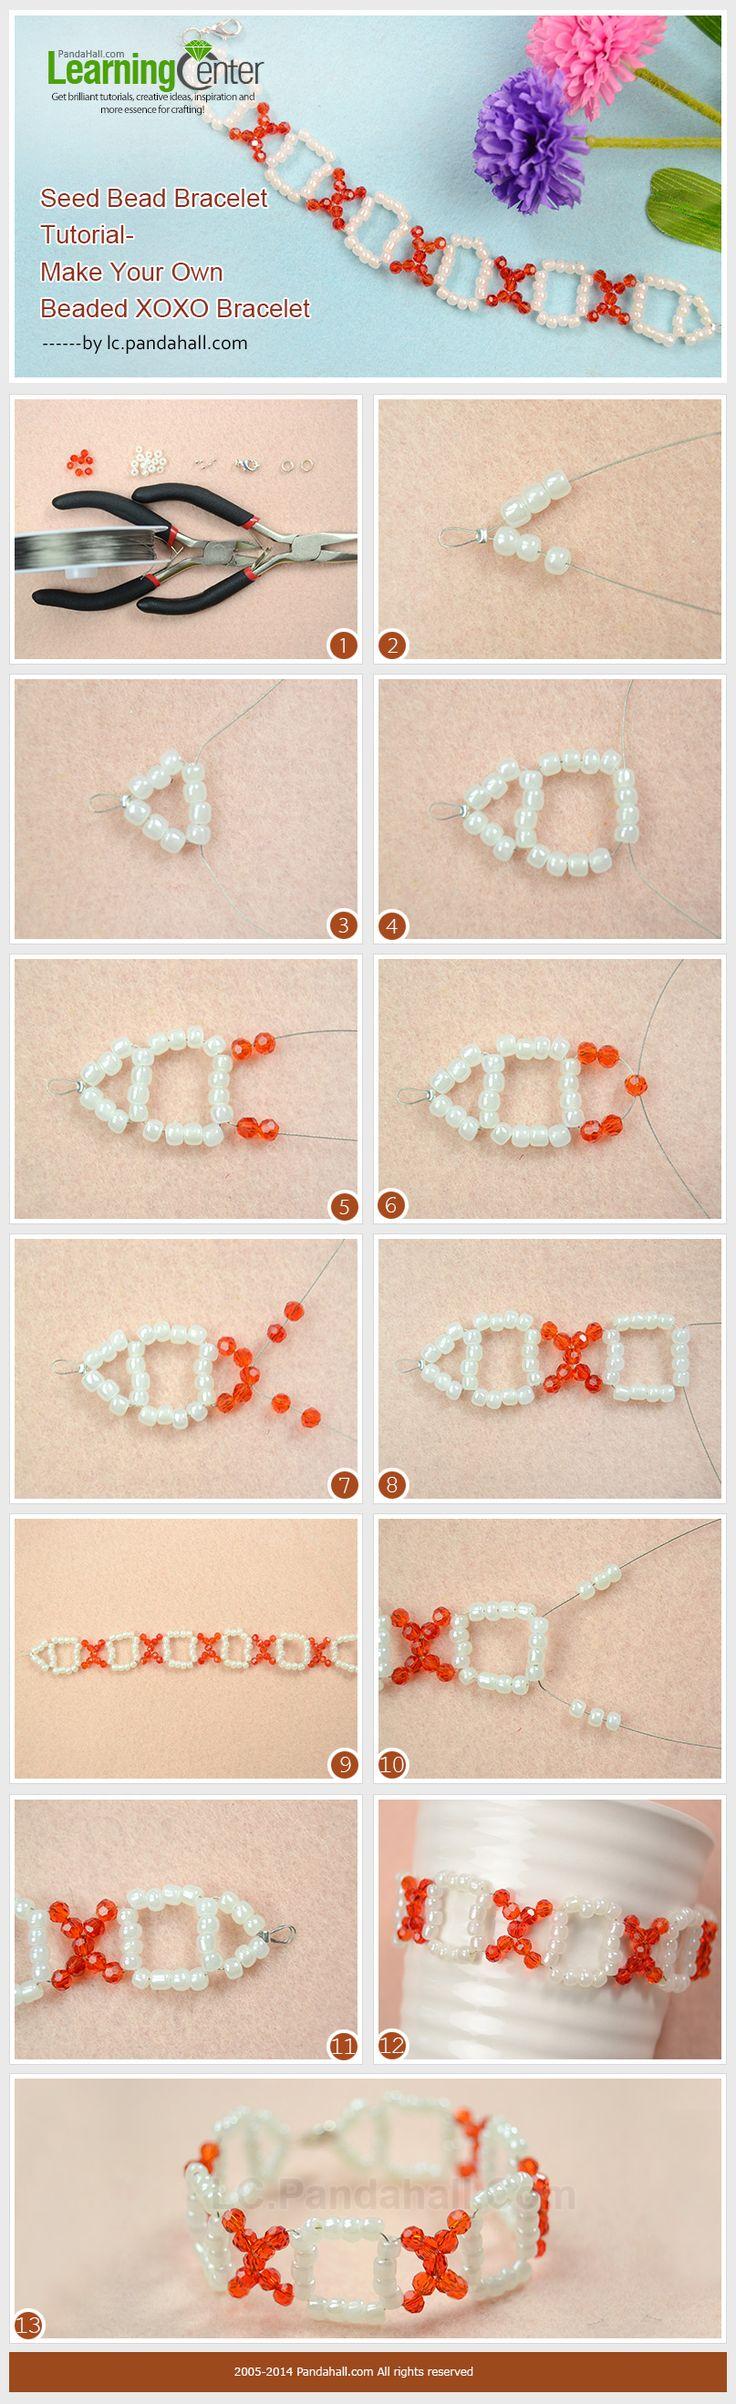 Seed Bead Bracelet Tutorialmake Your Own Simple Beaded Xoxo Bracelet